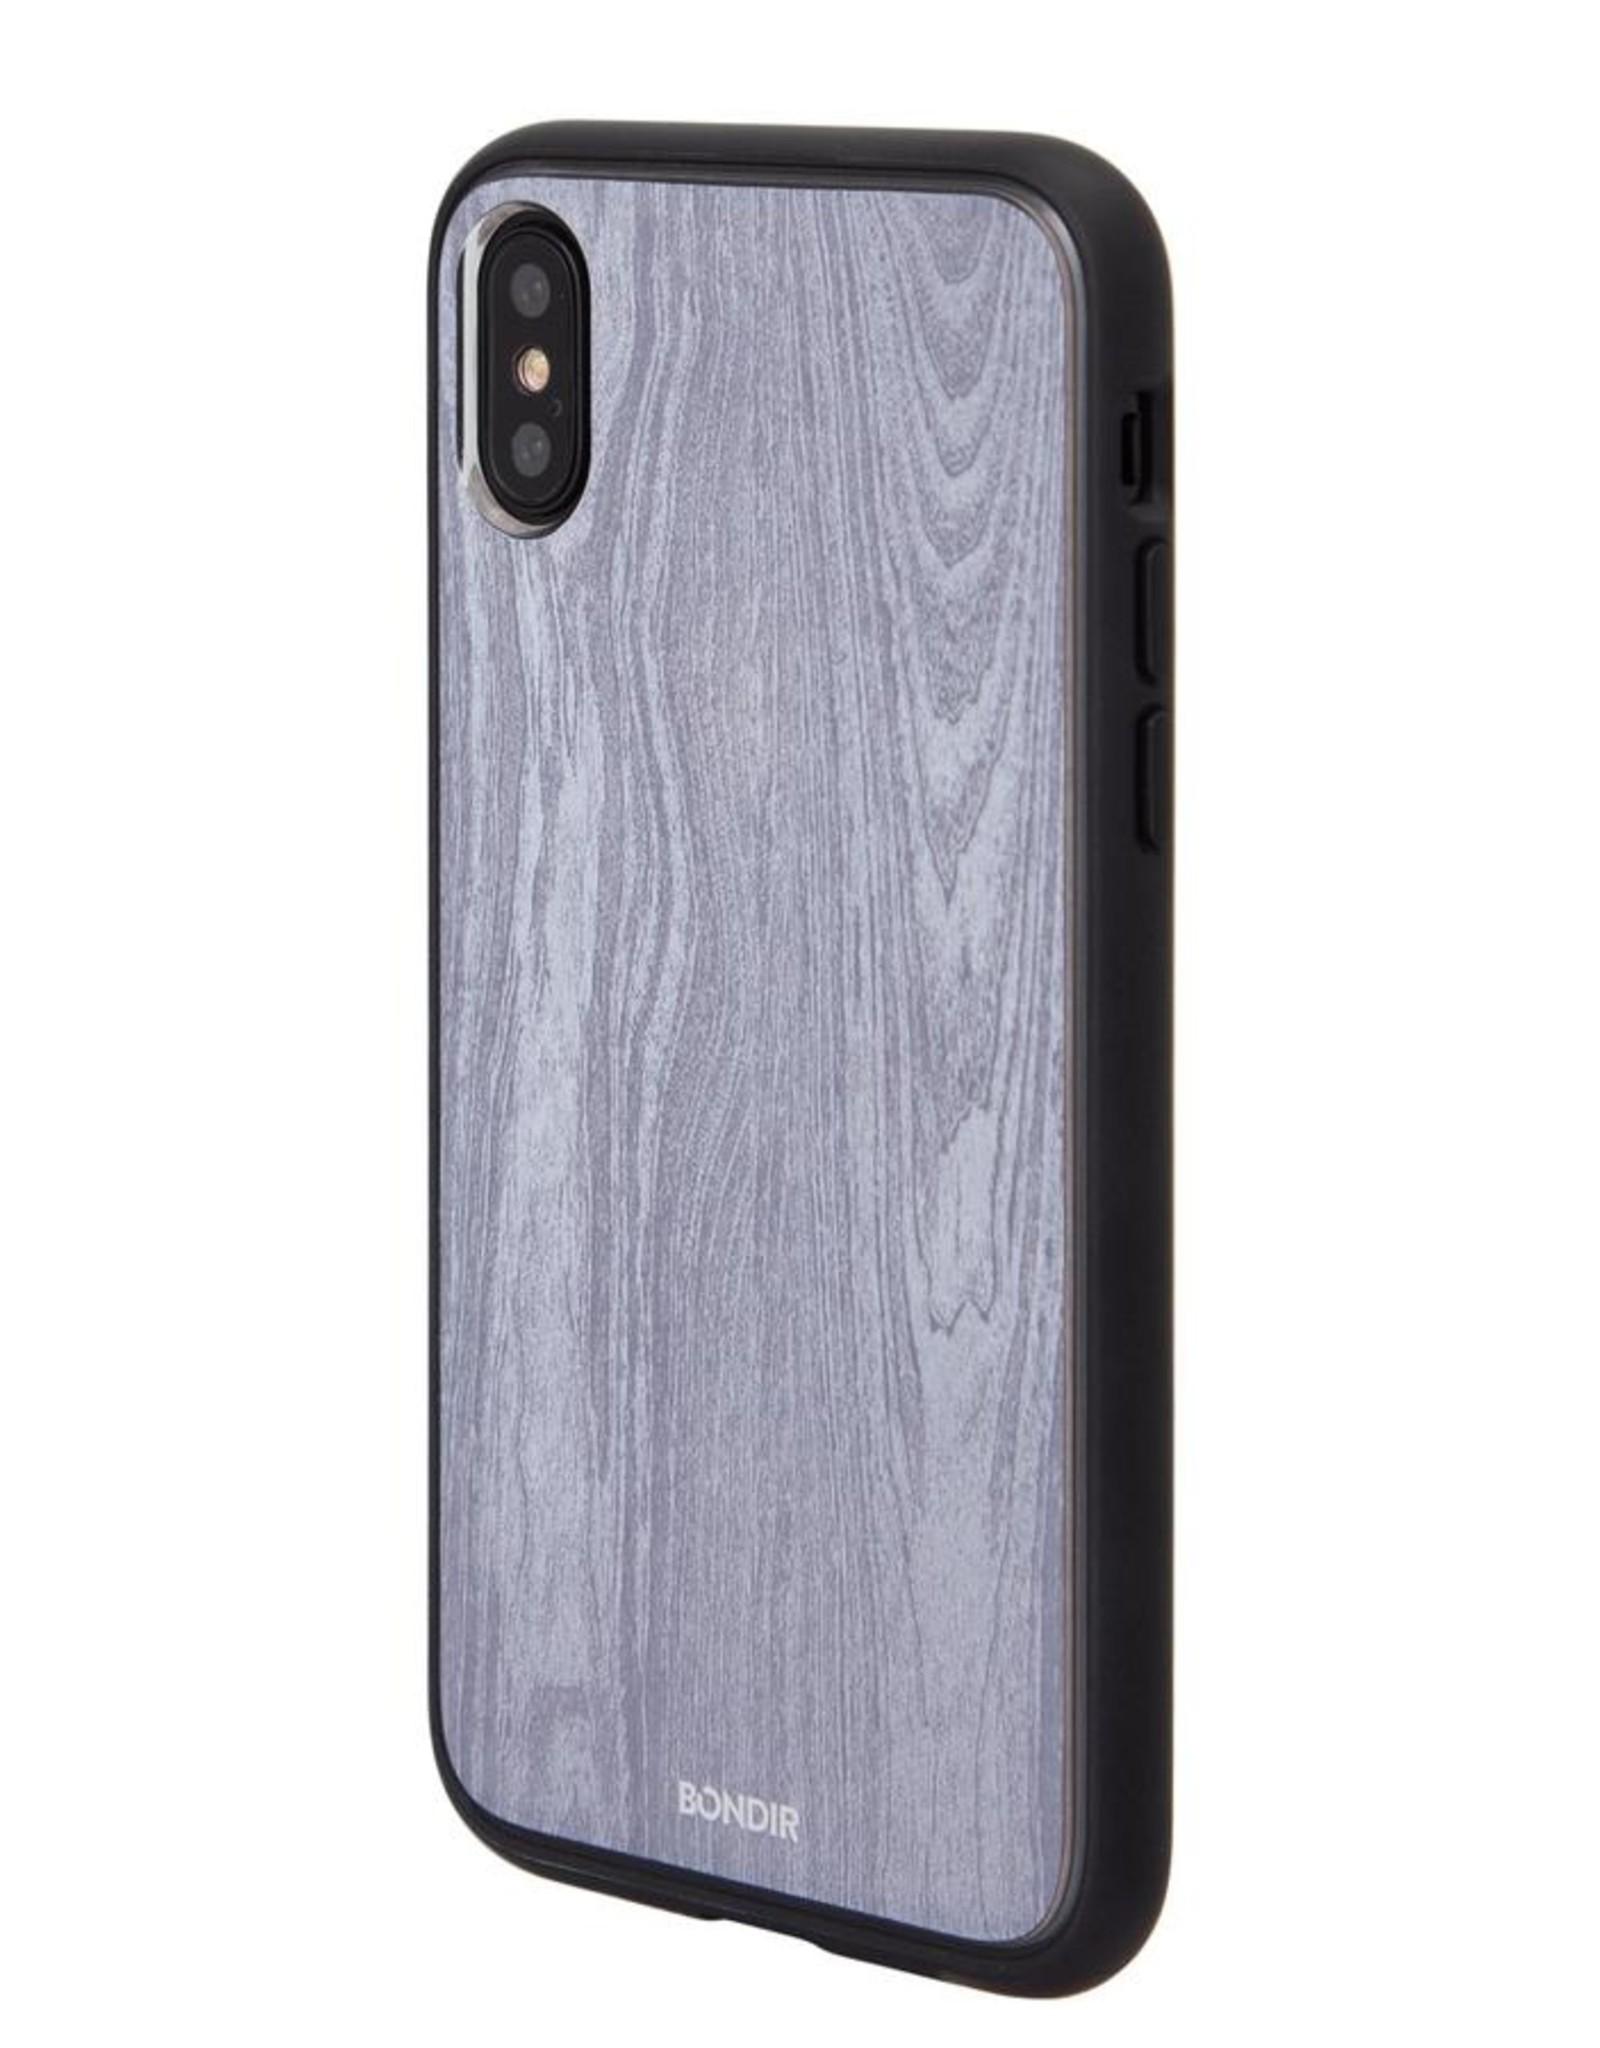 Bondir Wireless Clear Coat Wood Grain iPhone X/Xs Case BD-278-020-BND